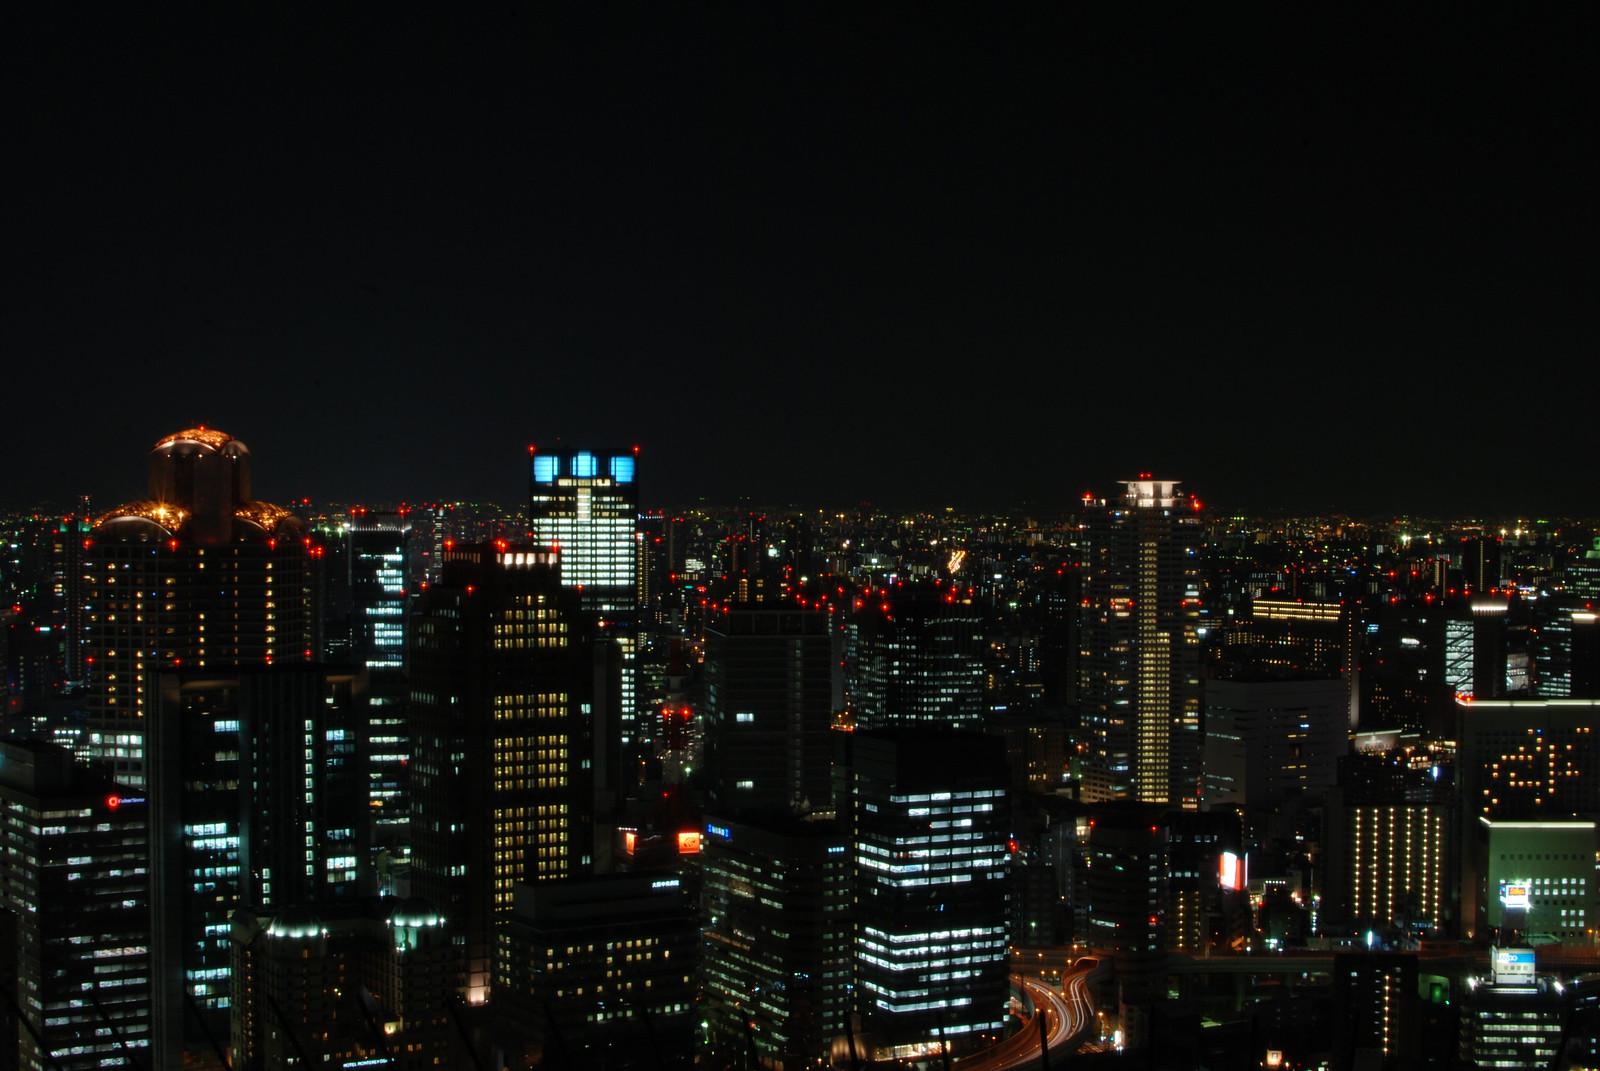 Vista de Osaka desde la Celeste Tower, toque Bladerunner